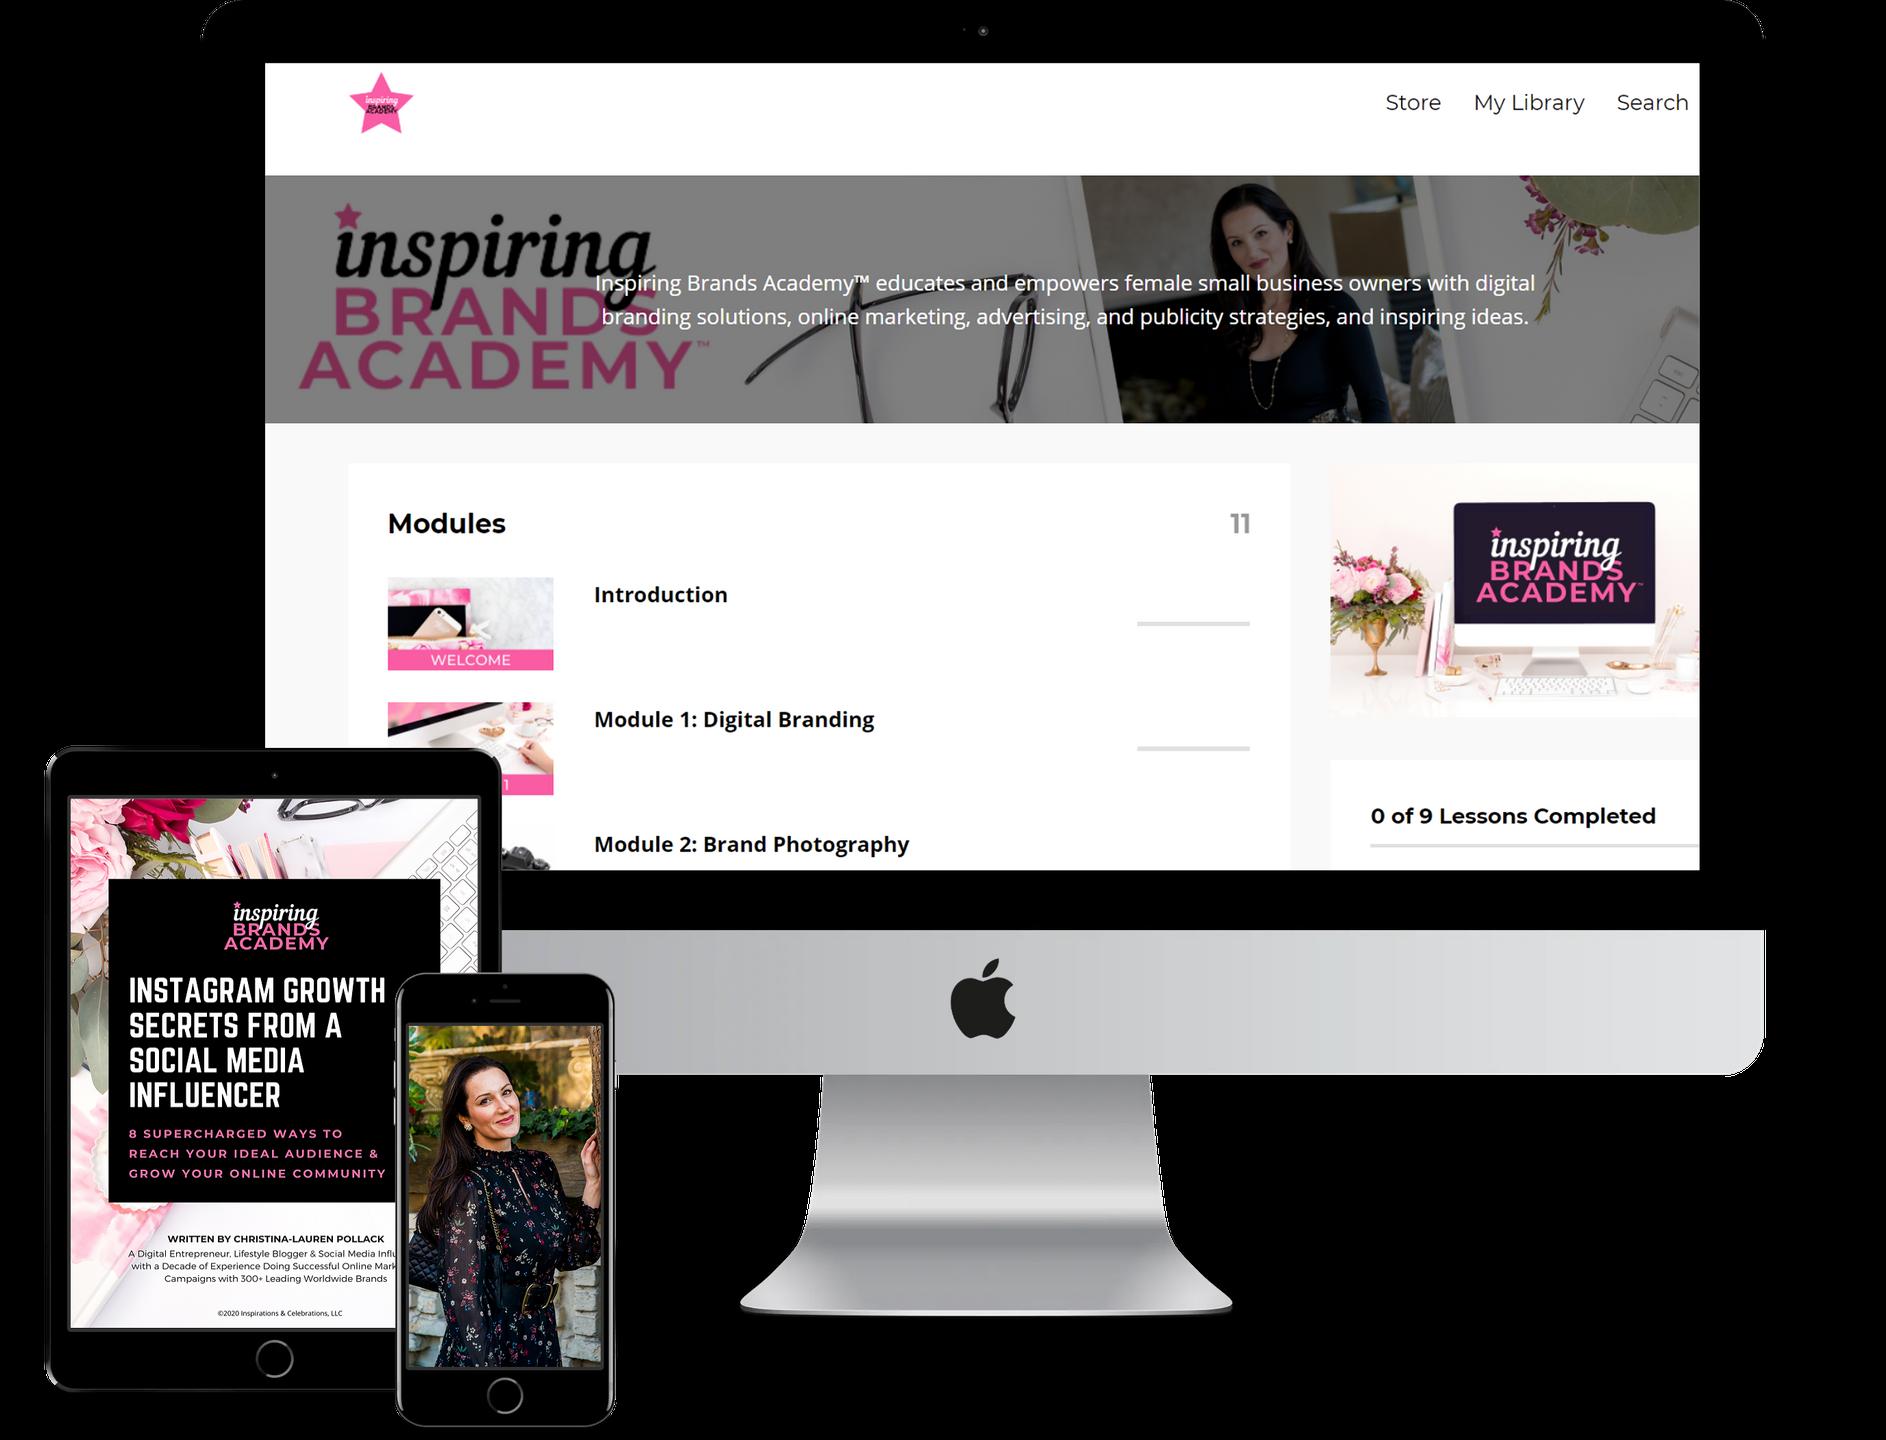 Inspiring Brands Academy Signature Course - Digital Entrepreneur and Business Branding Expert Christina-Lauren Pollack